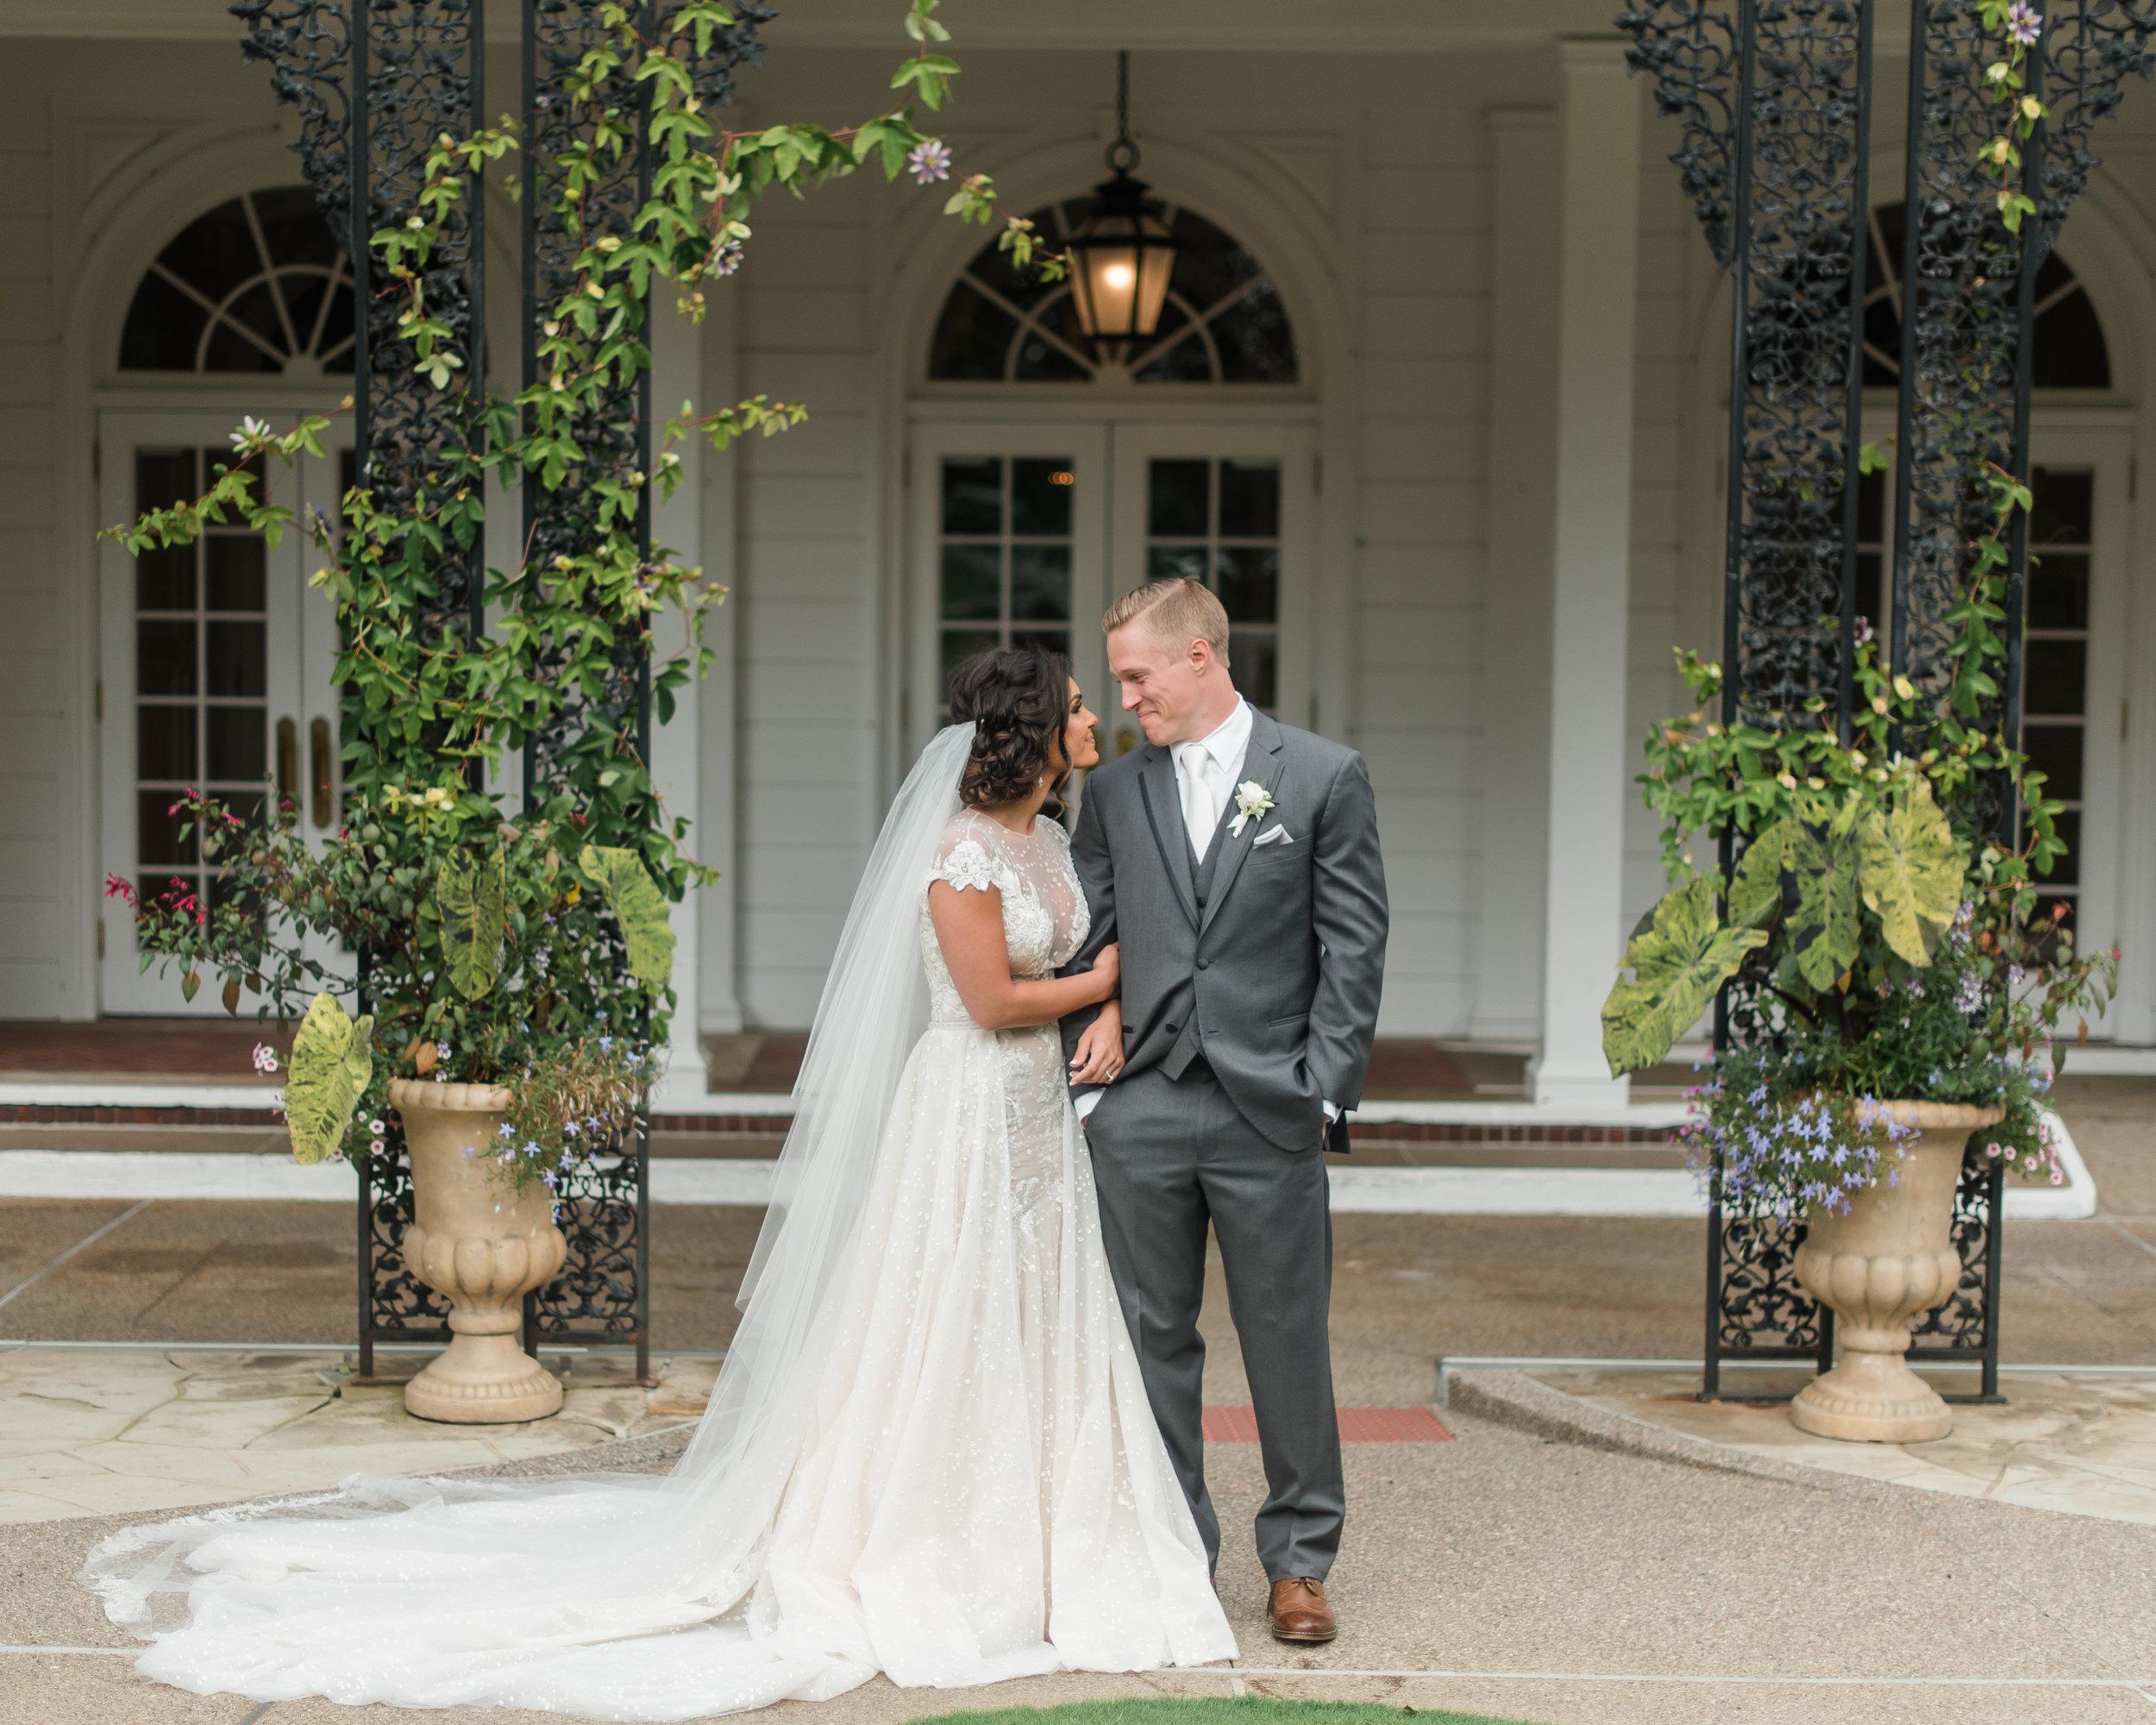 pittsburgh-wedding-photographer-classic-greenery-foxchapelgolfclub0019.jpg